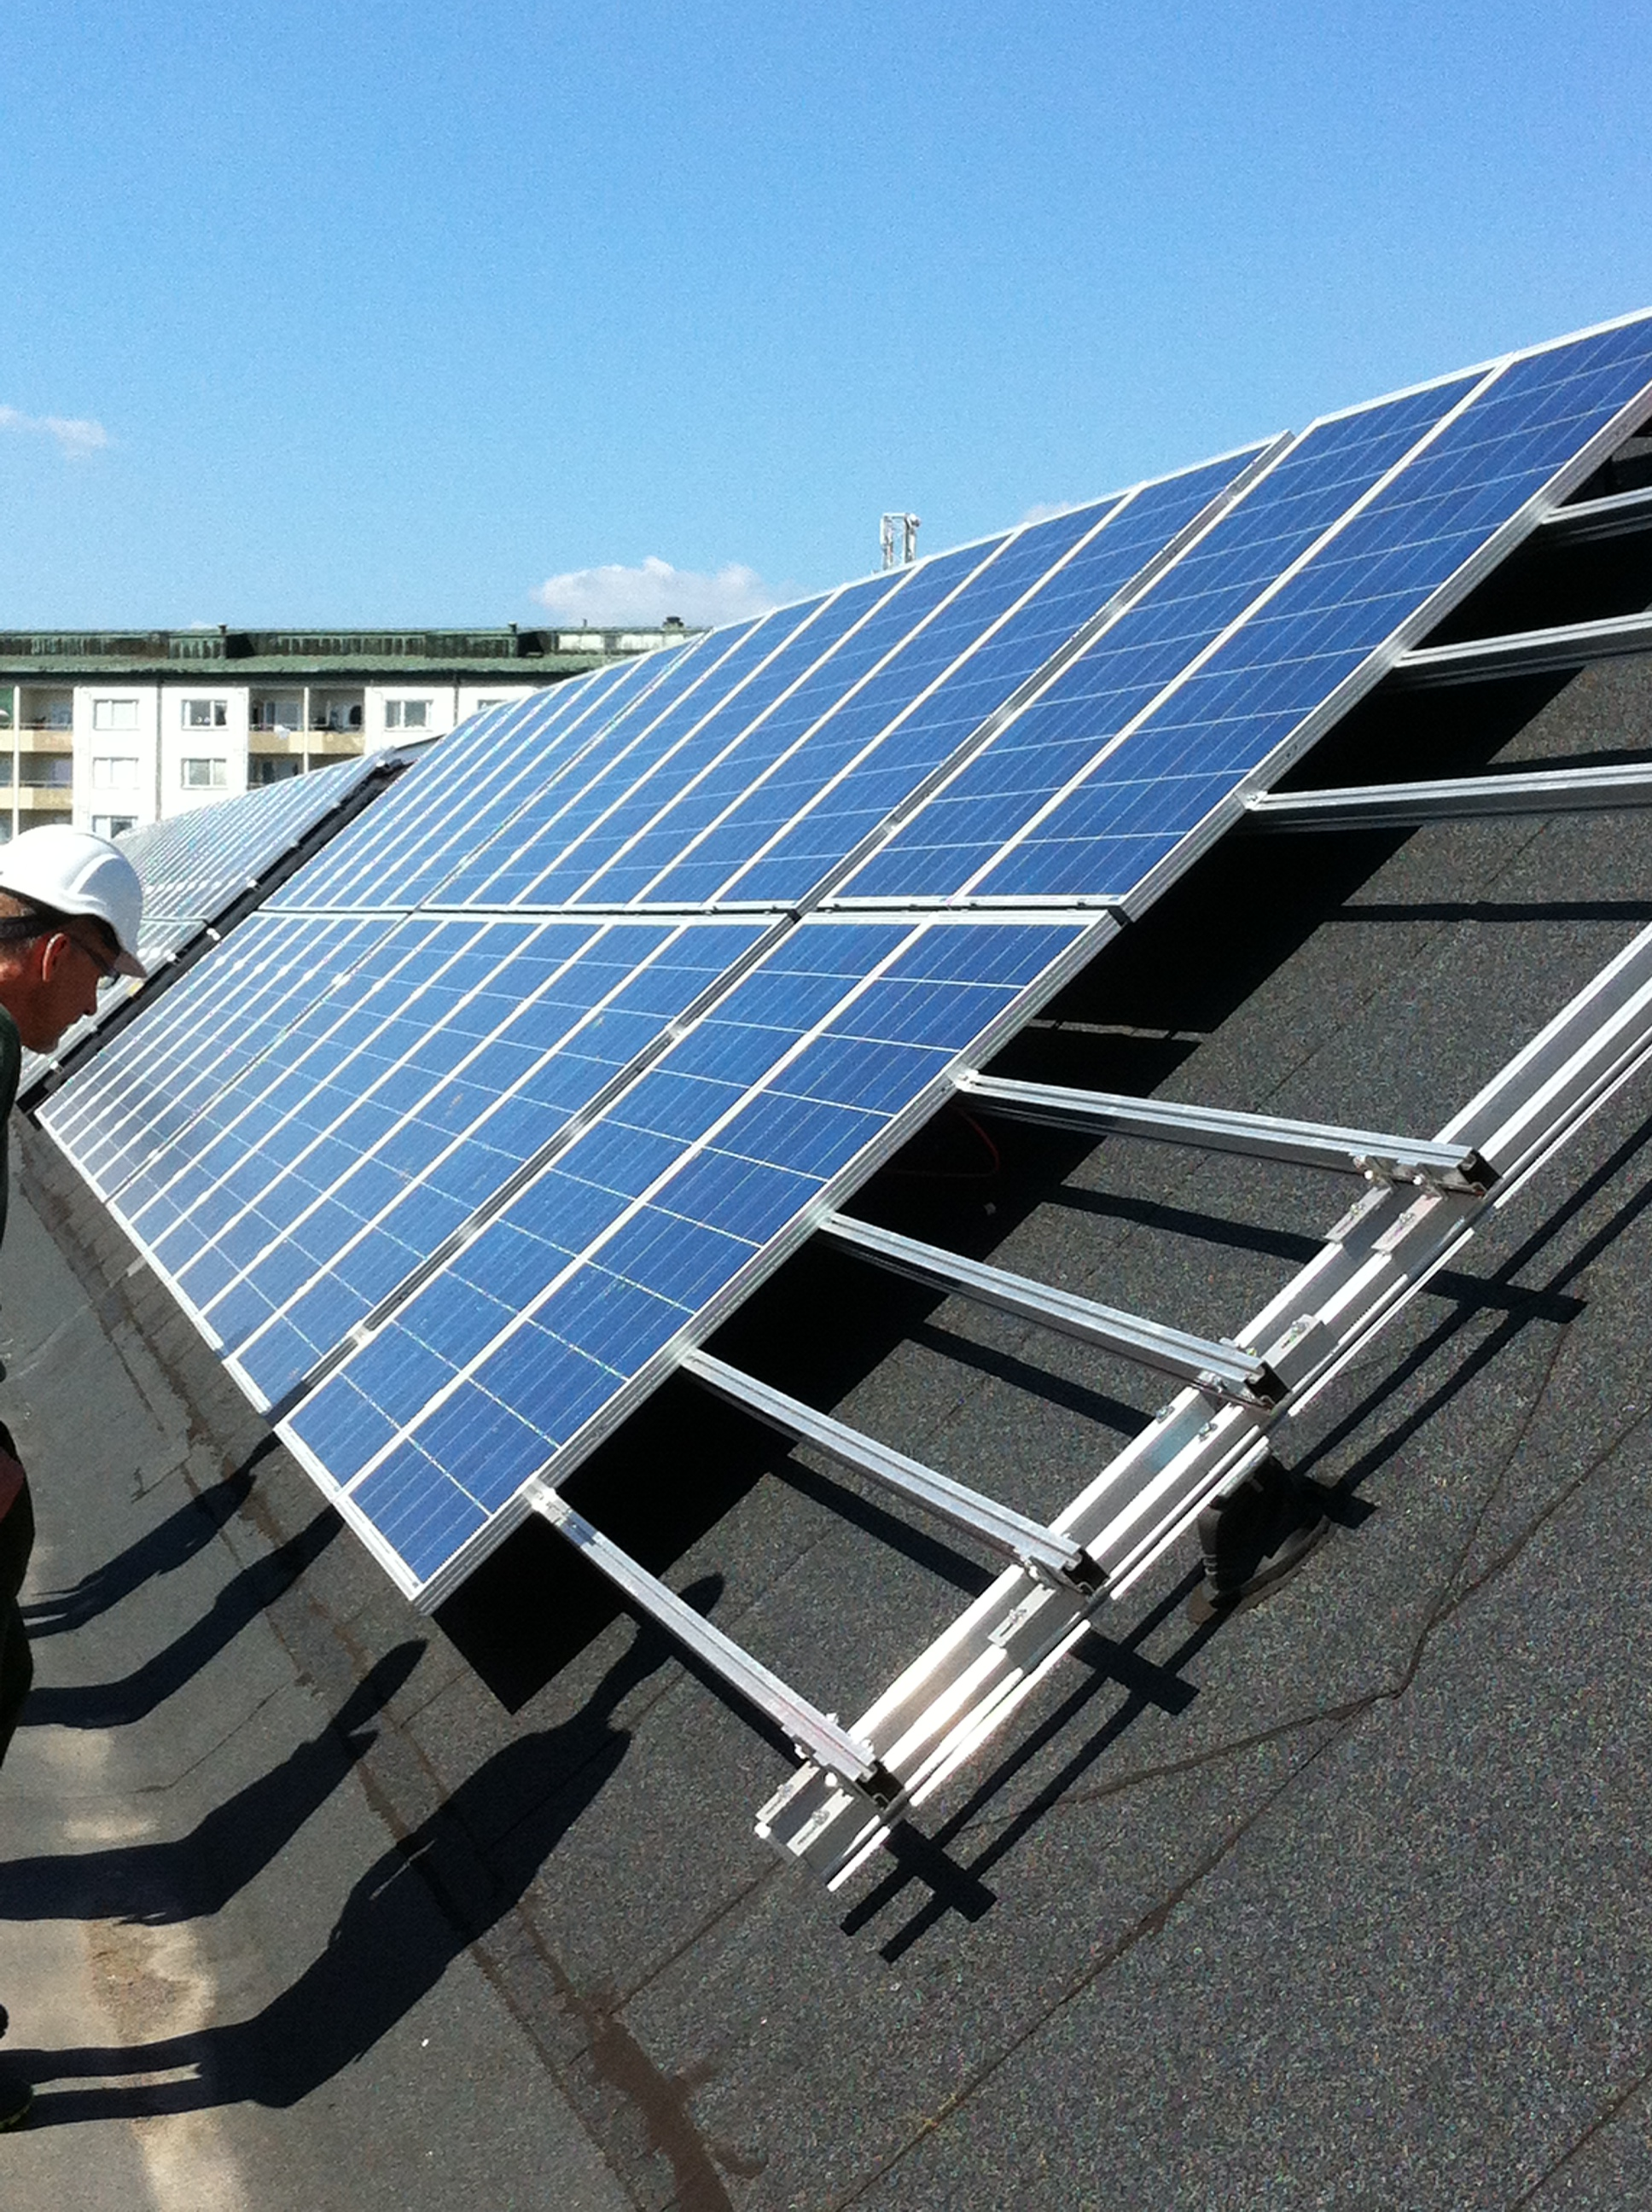 Solpanelerna på Simonsland i Borås